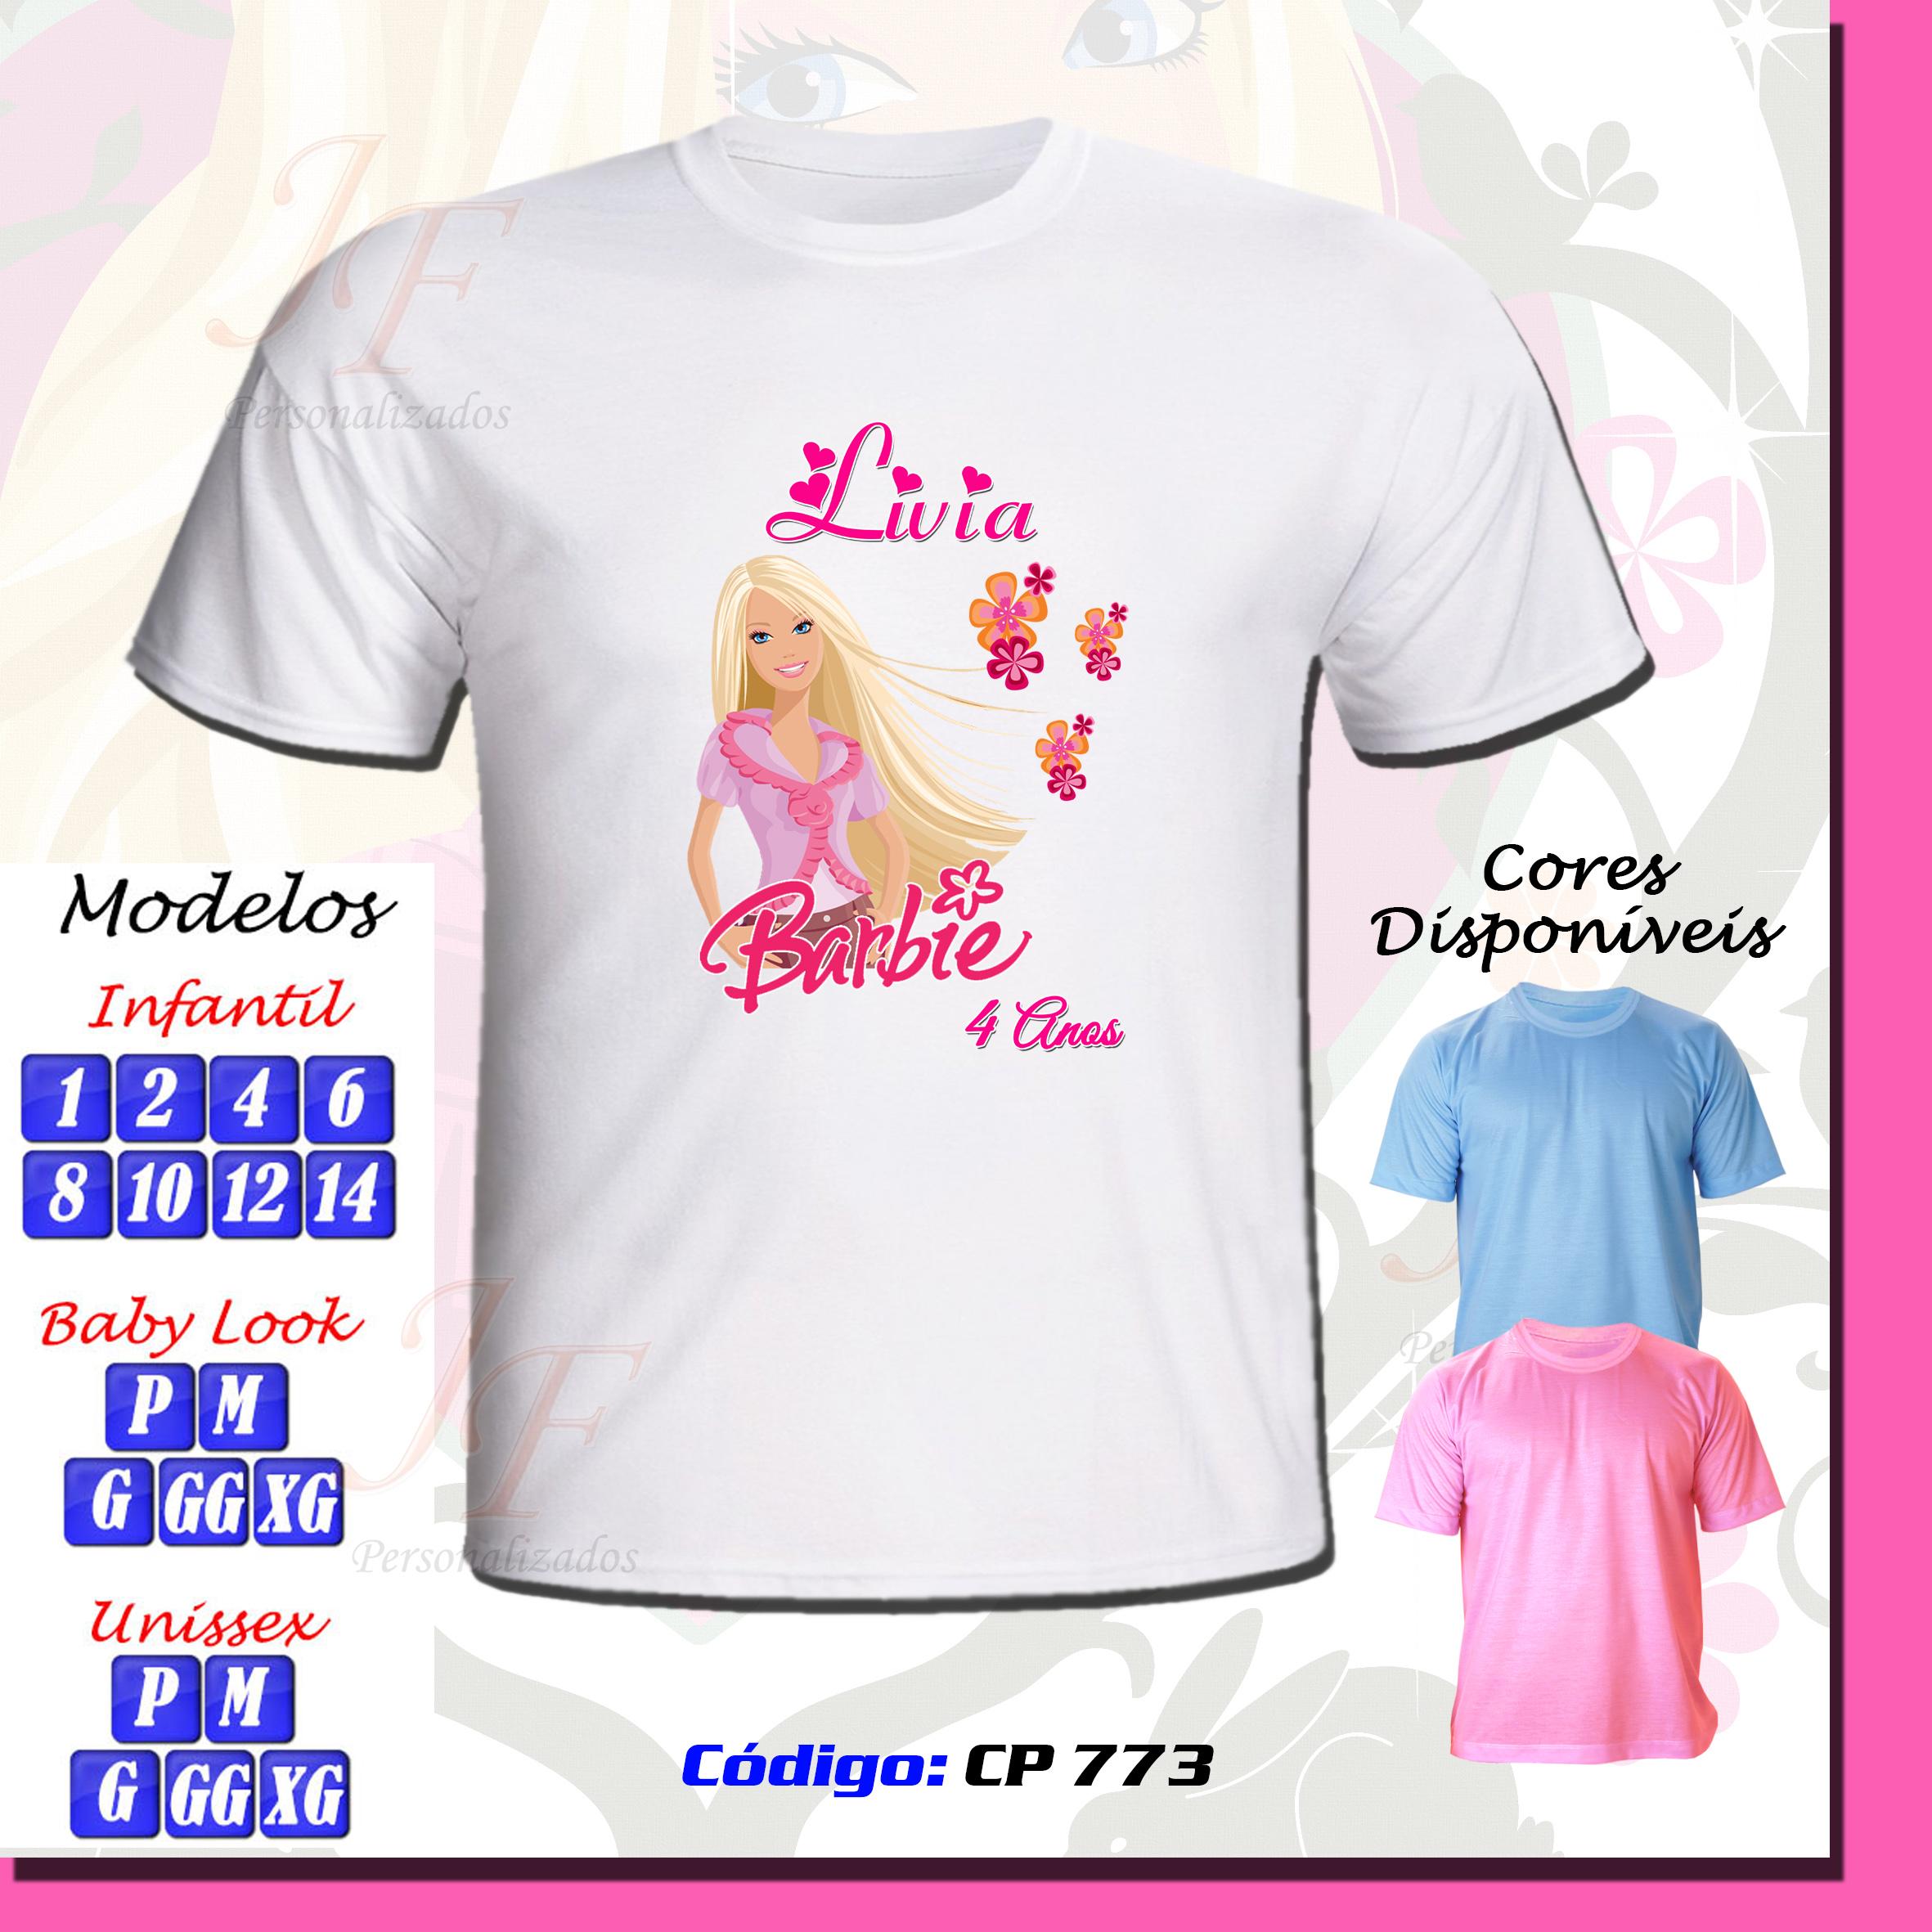 Camiseta Blusinha Barbie Infantil  abb35b82f2ec4